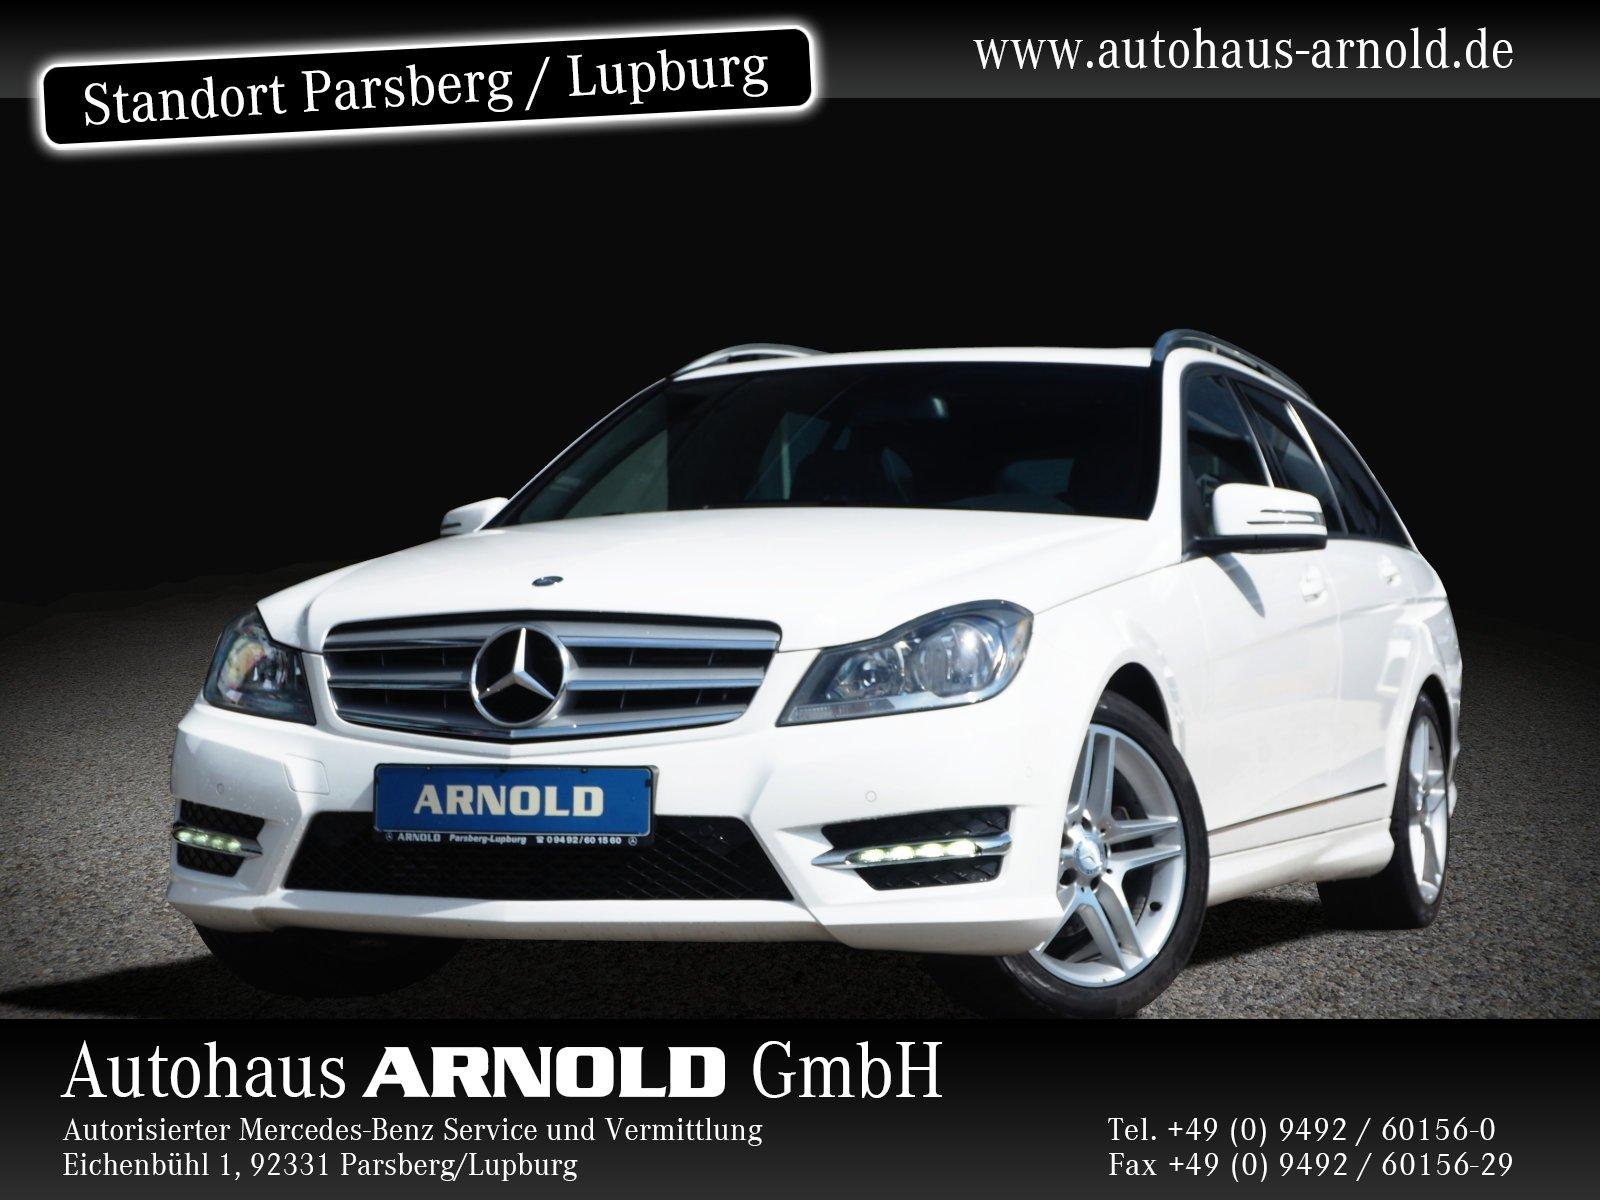 Mercedes-Benz C 220 CDI T AMG-Line SHD PTS Sitzh. Automatik, Jahr 2014, Diesel